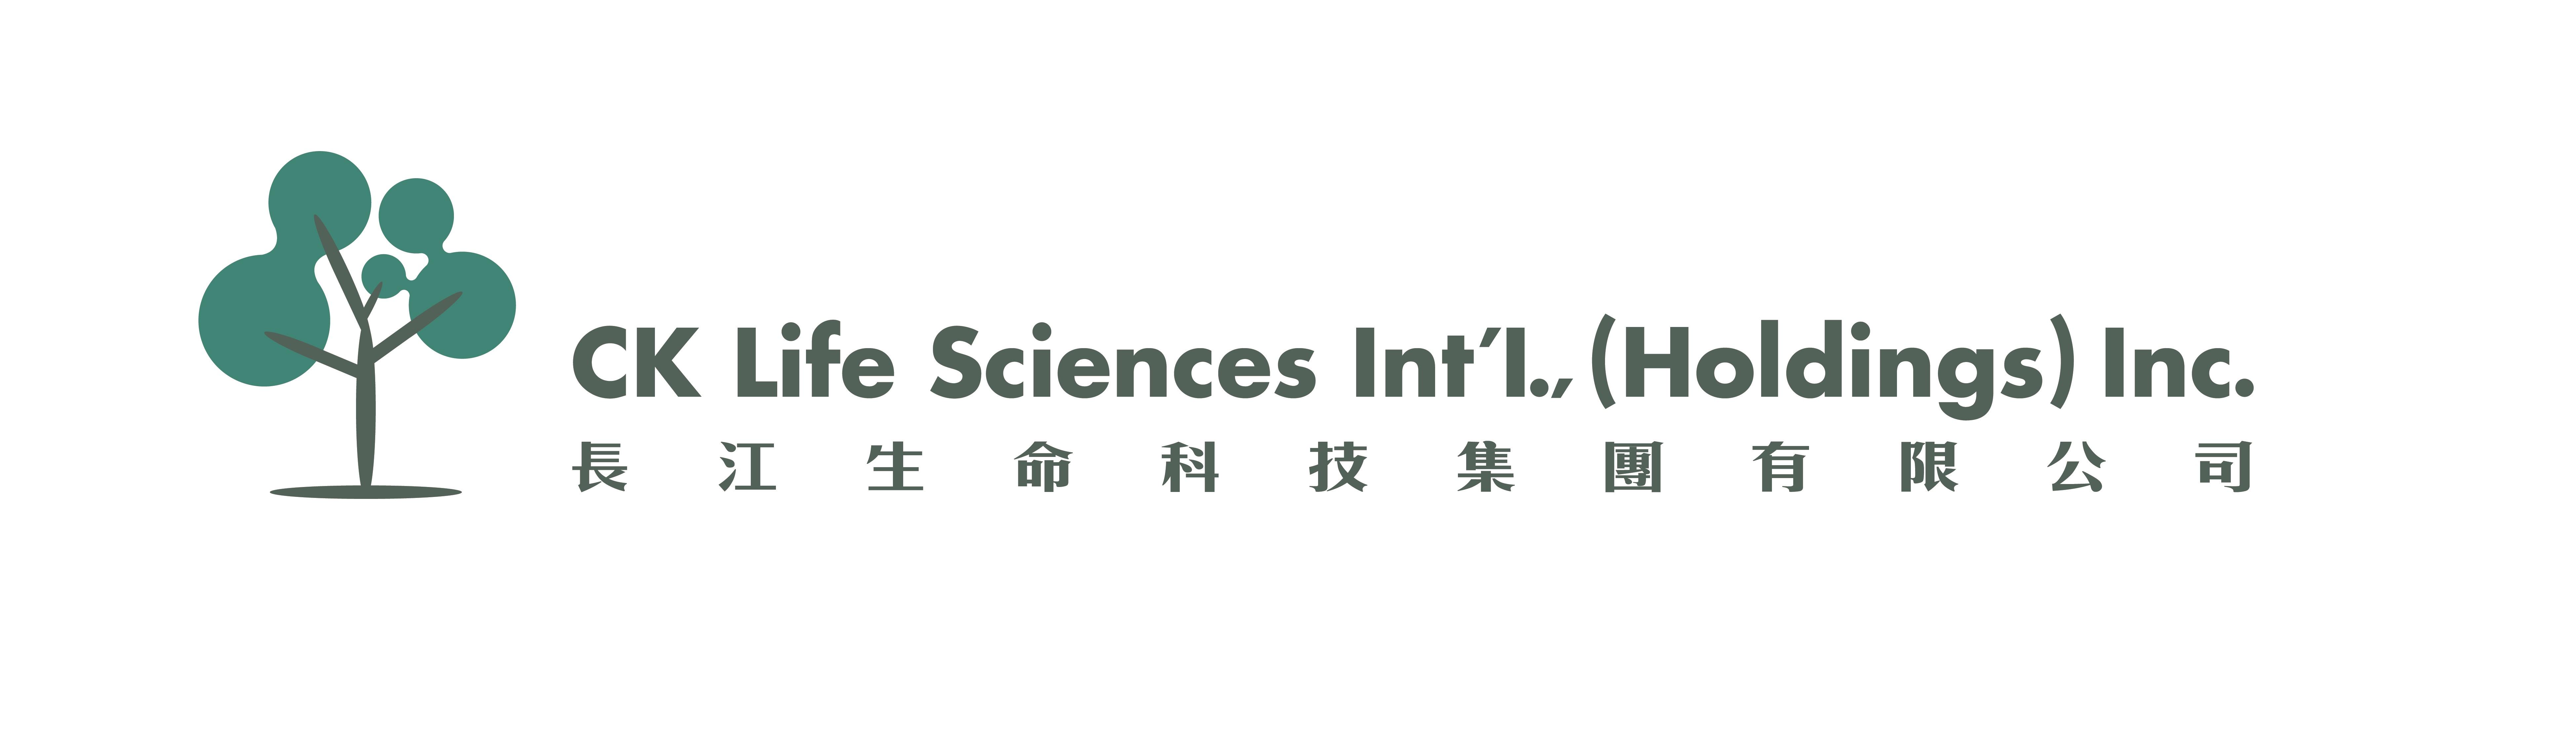 CK Life Sciences Int'l., (Holdings) Inc.